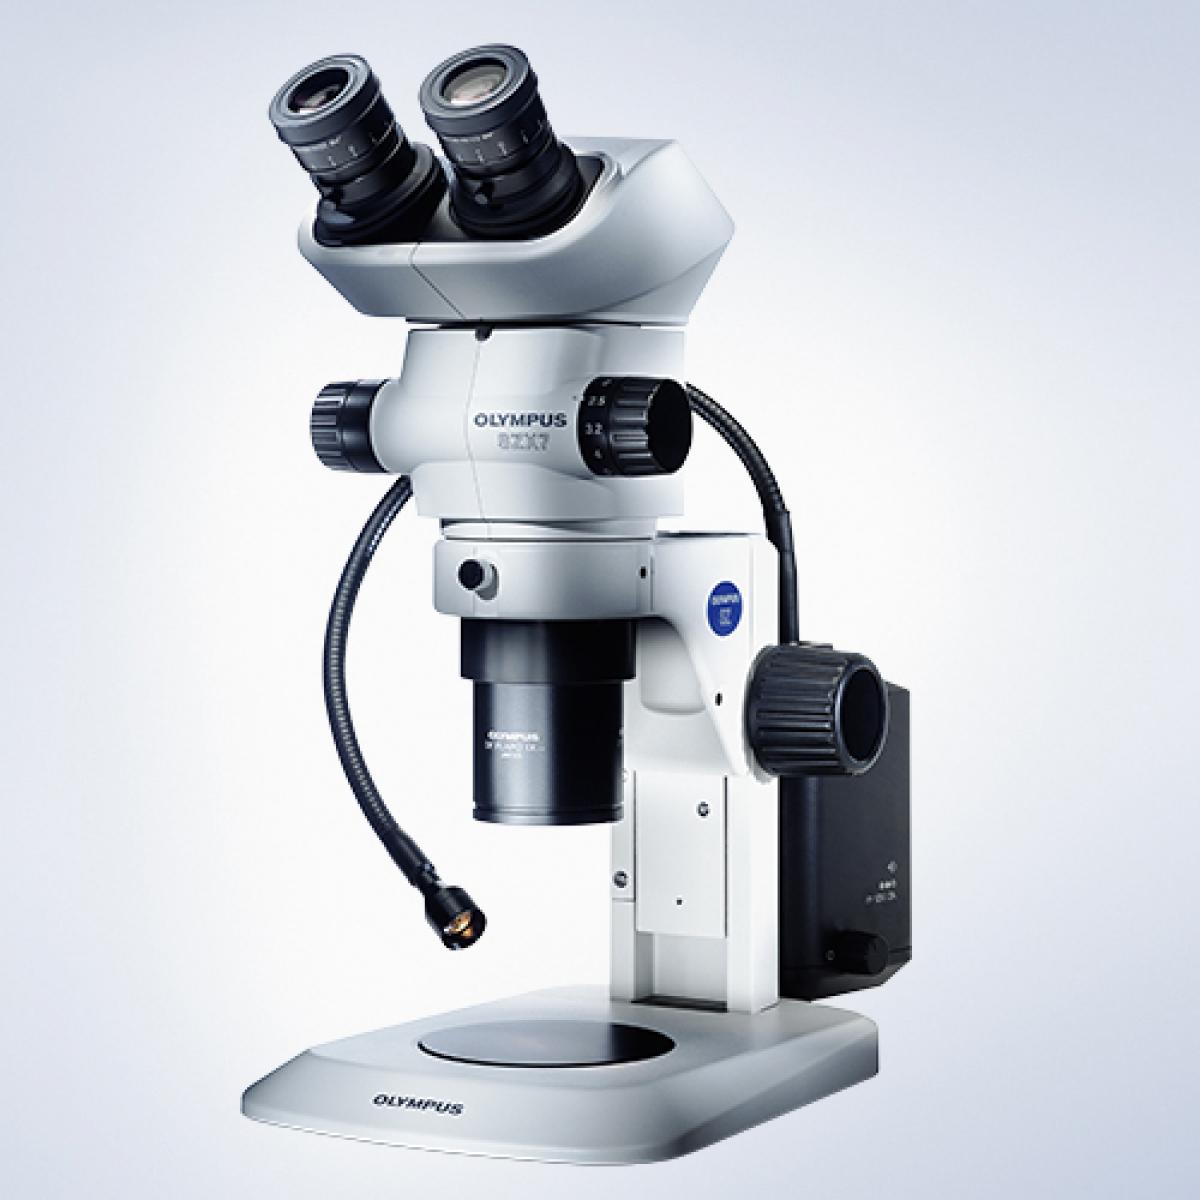 Stéréomicroscope OLYMPUS SZX7 -4